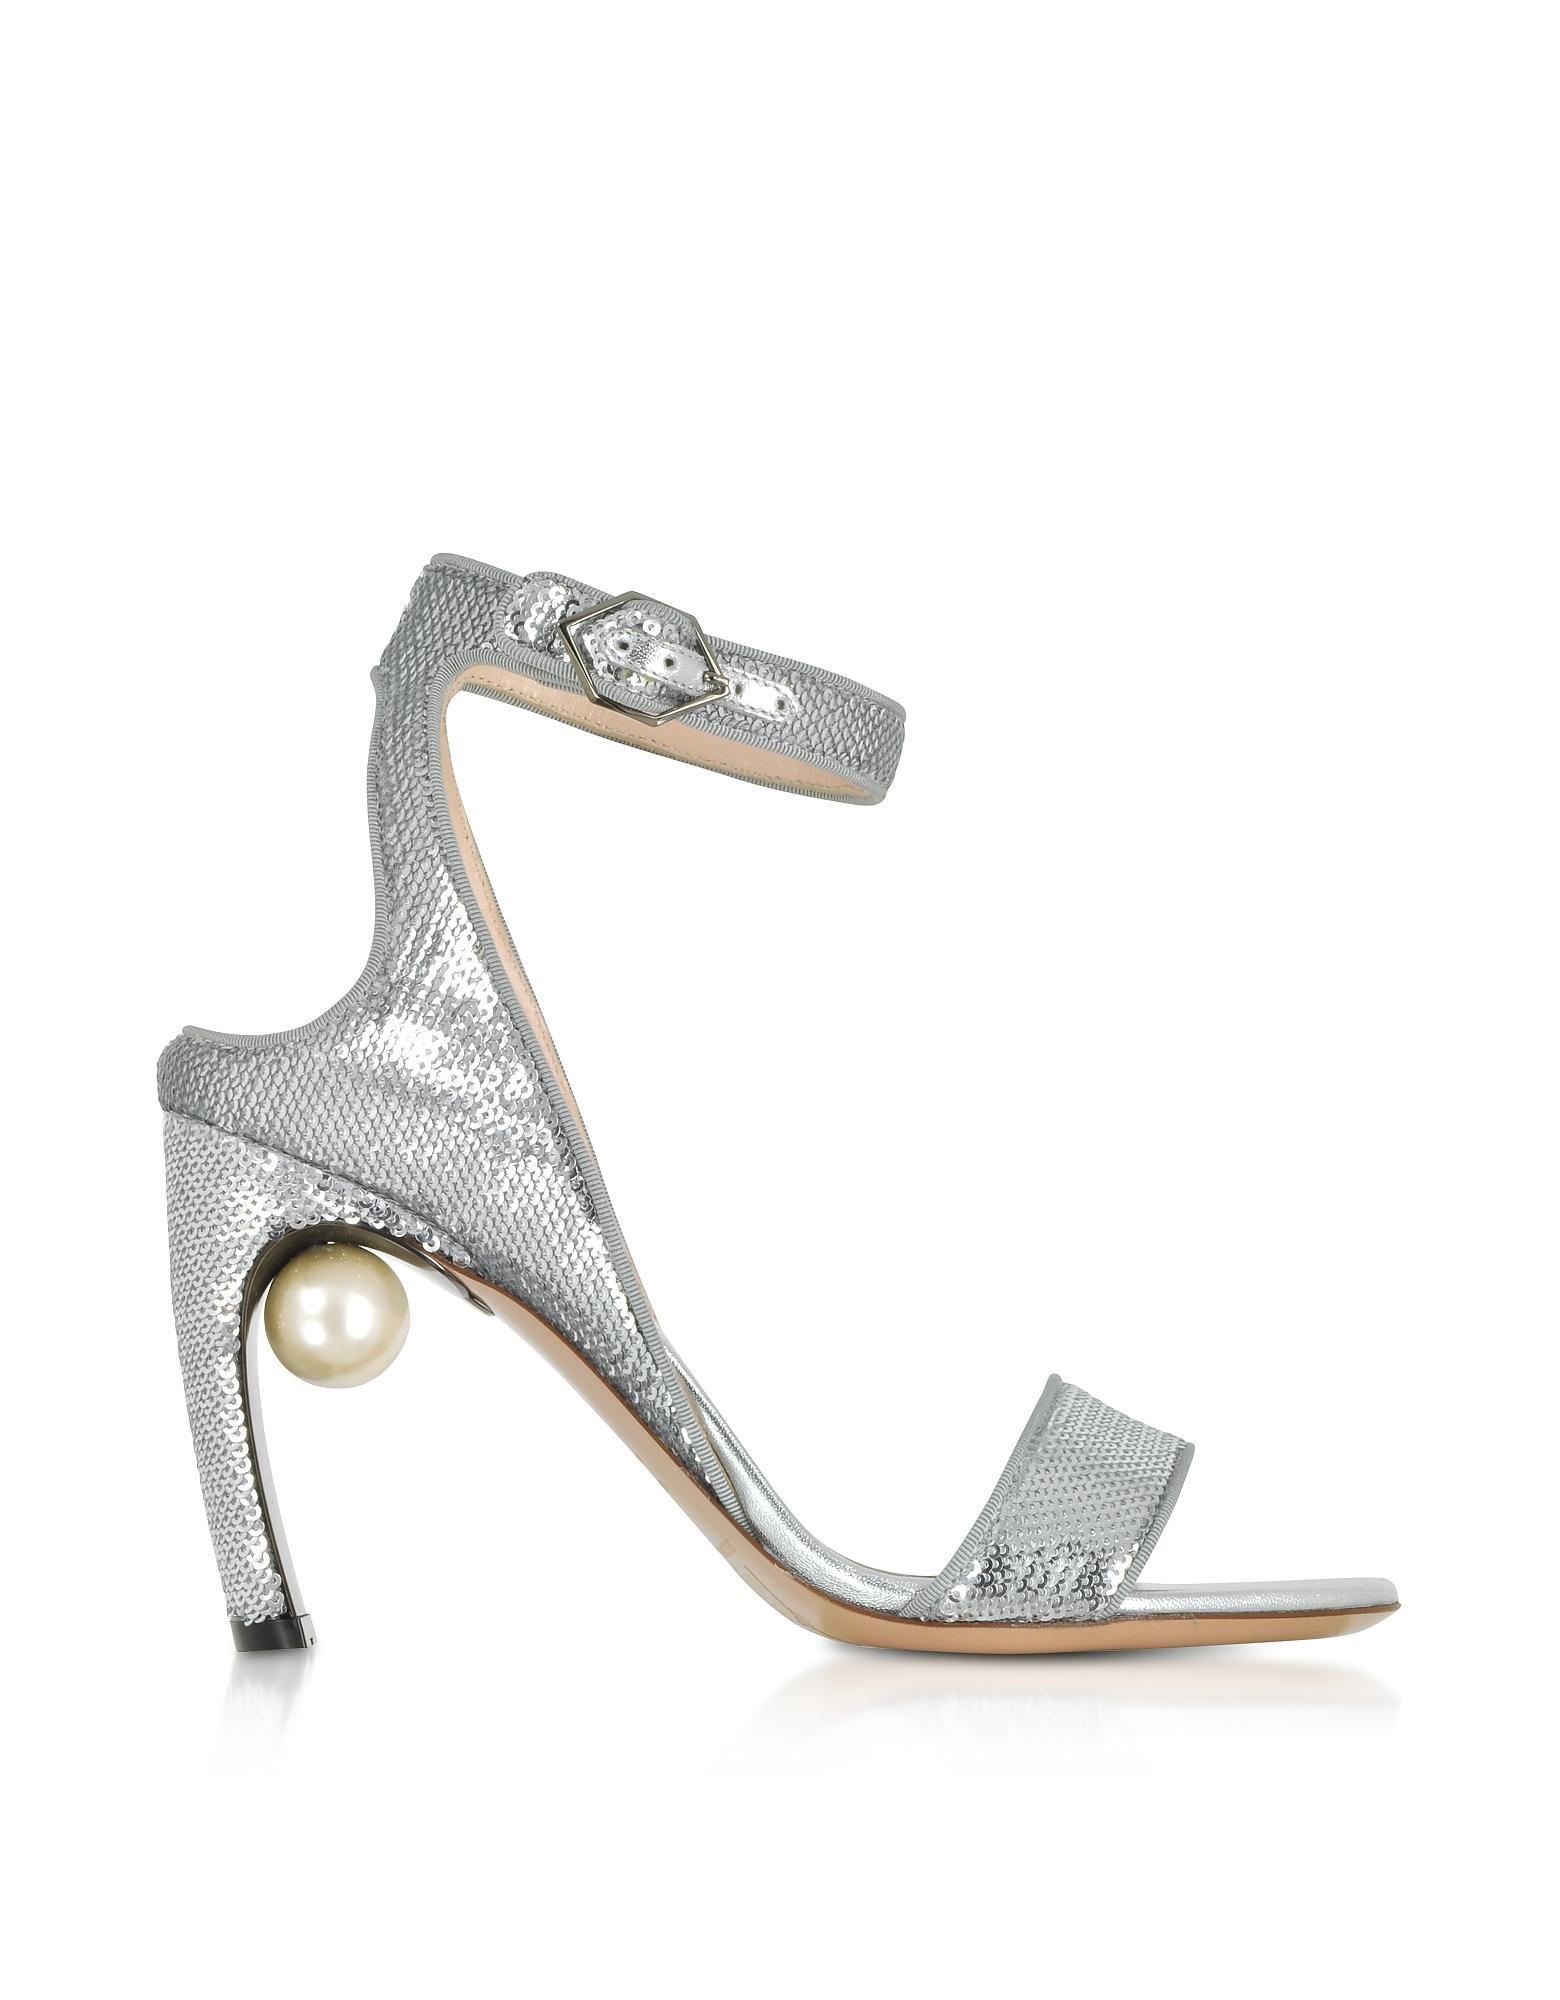 2c96f82eef8f Nicholas Kirkwood Silver Sequins 90Mm Lola Pearl Sandals